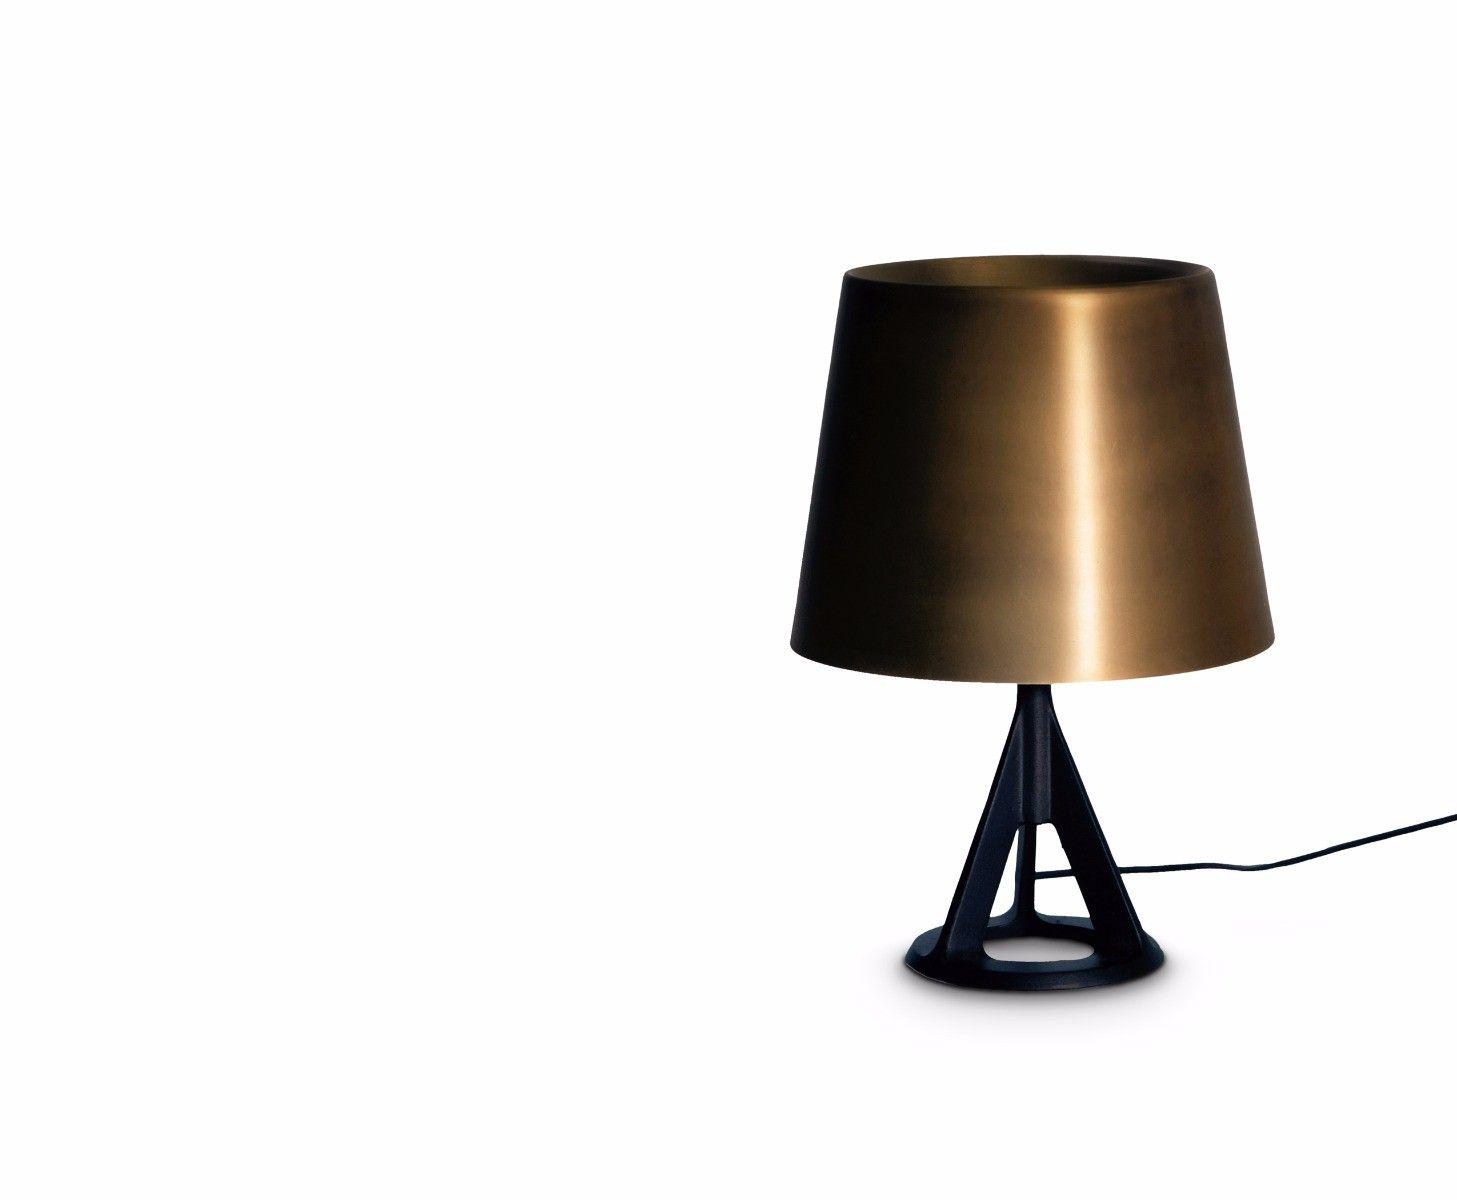 Base Brass Table Table Lights Tom Dixon Brass Table Lamps Light Table Brass Wall Light